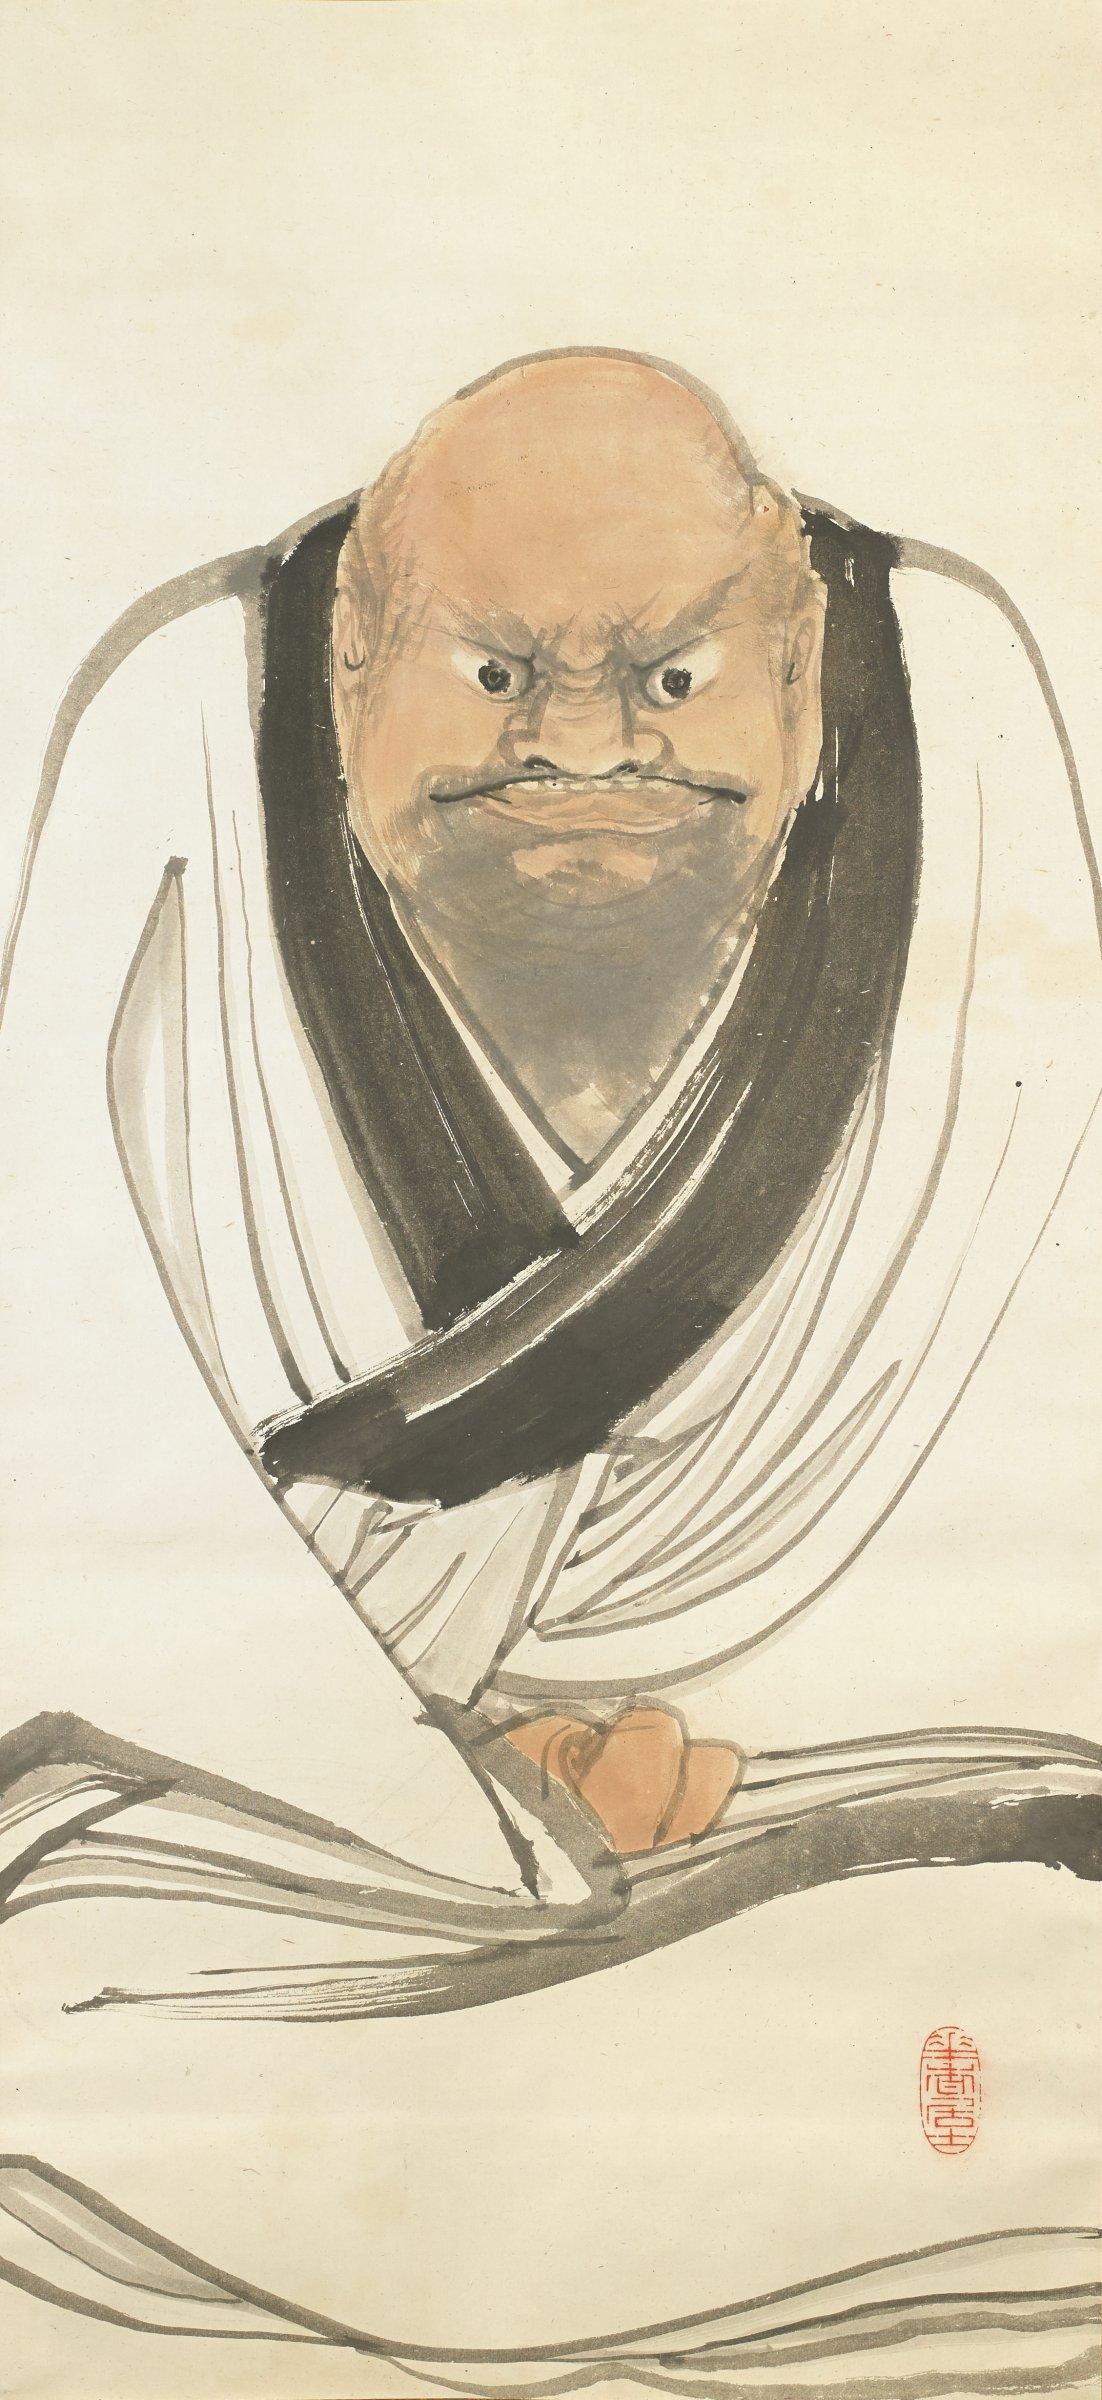 Daruma, Tsuji Kako, ink and color on paper